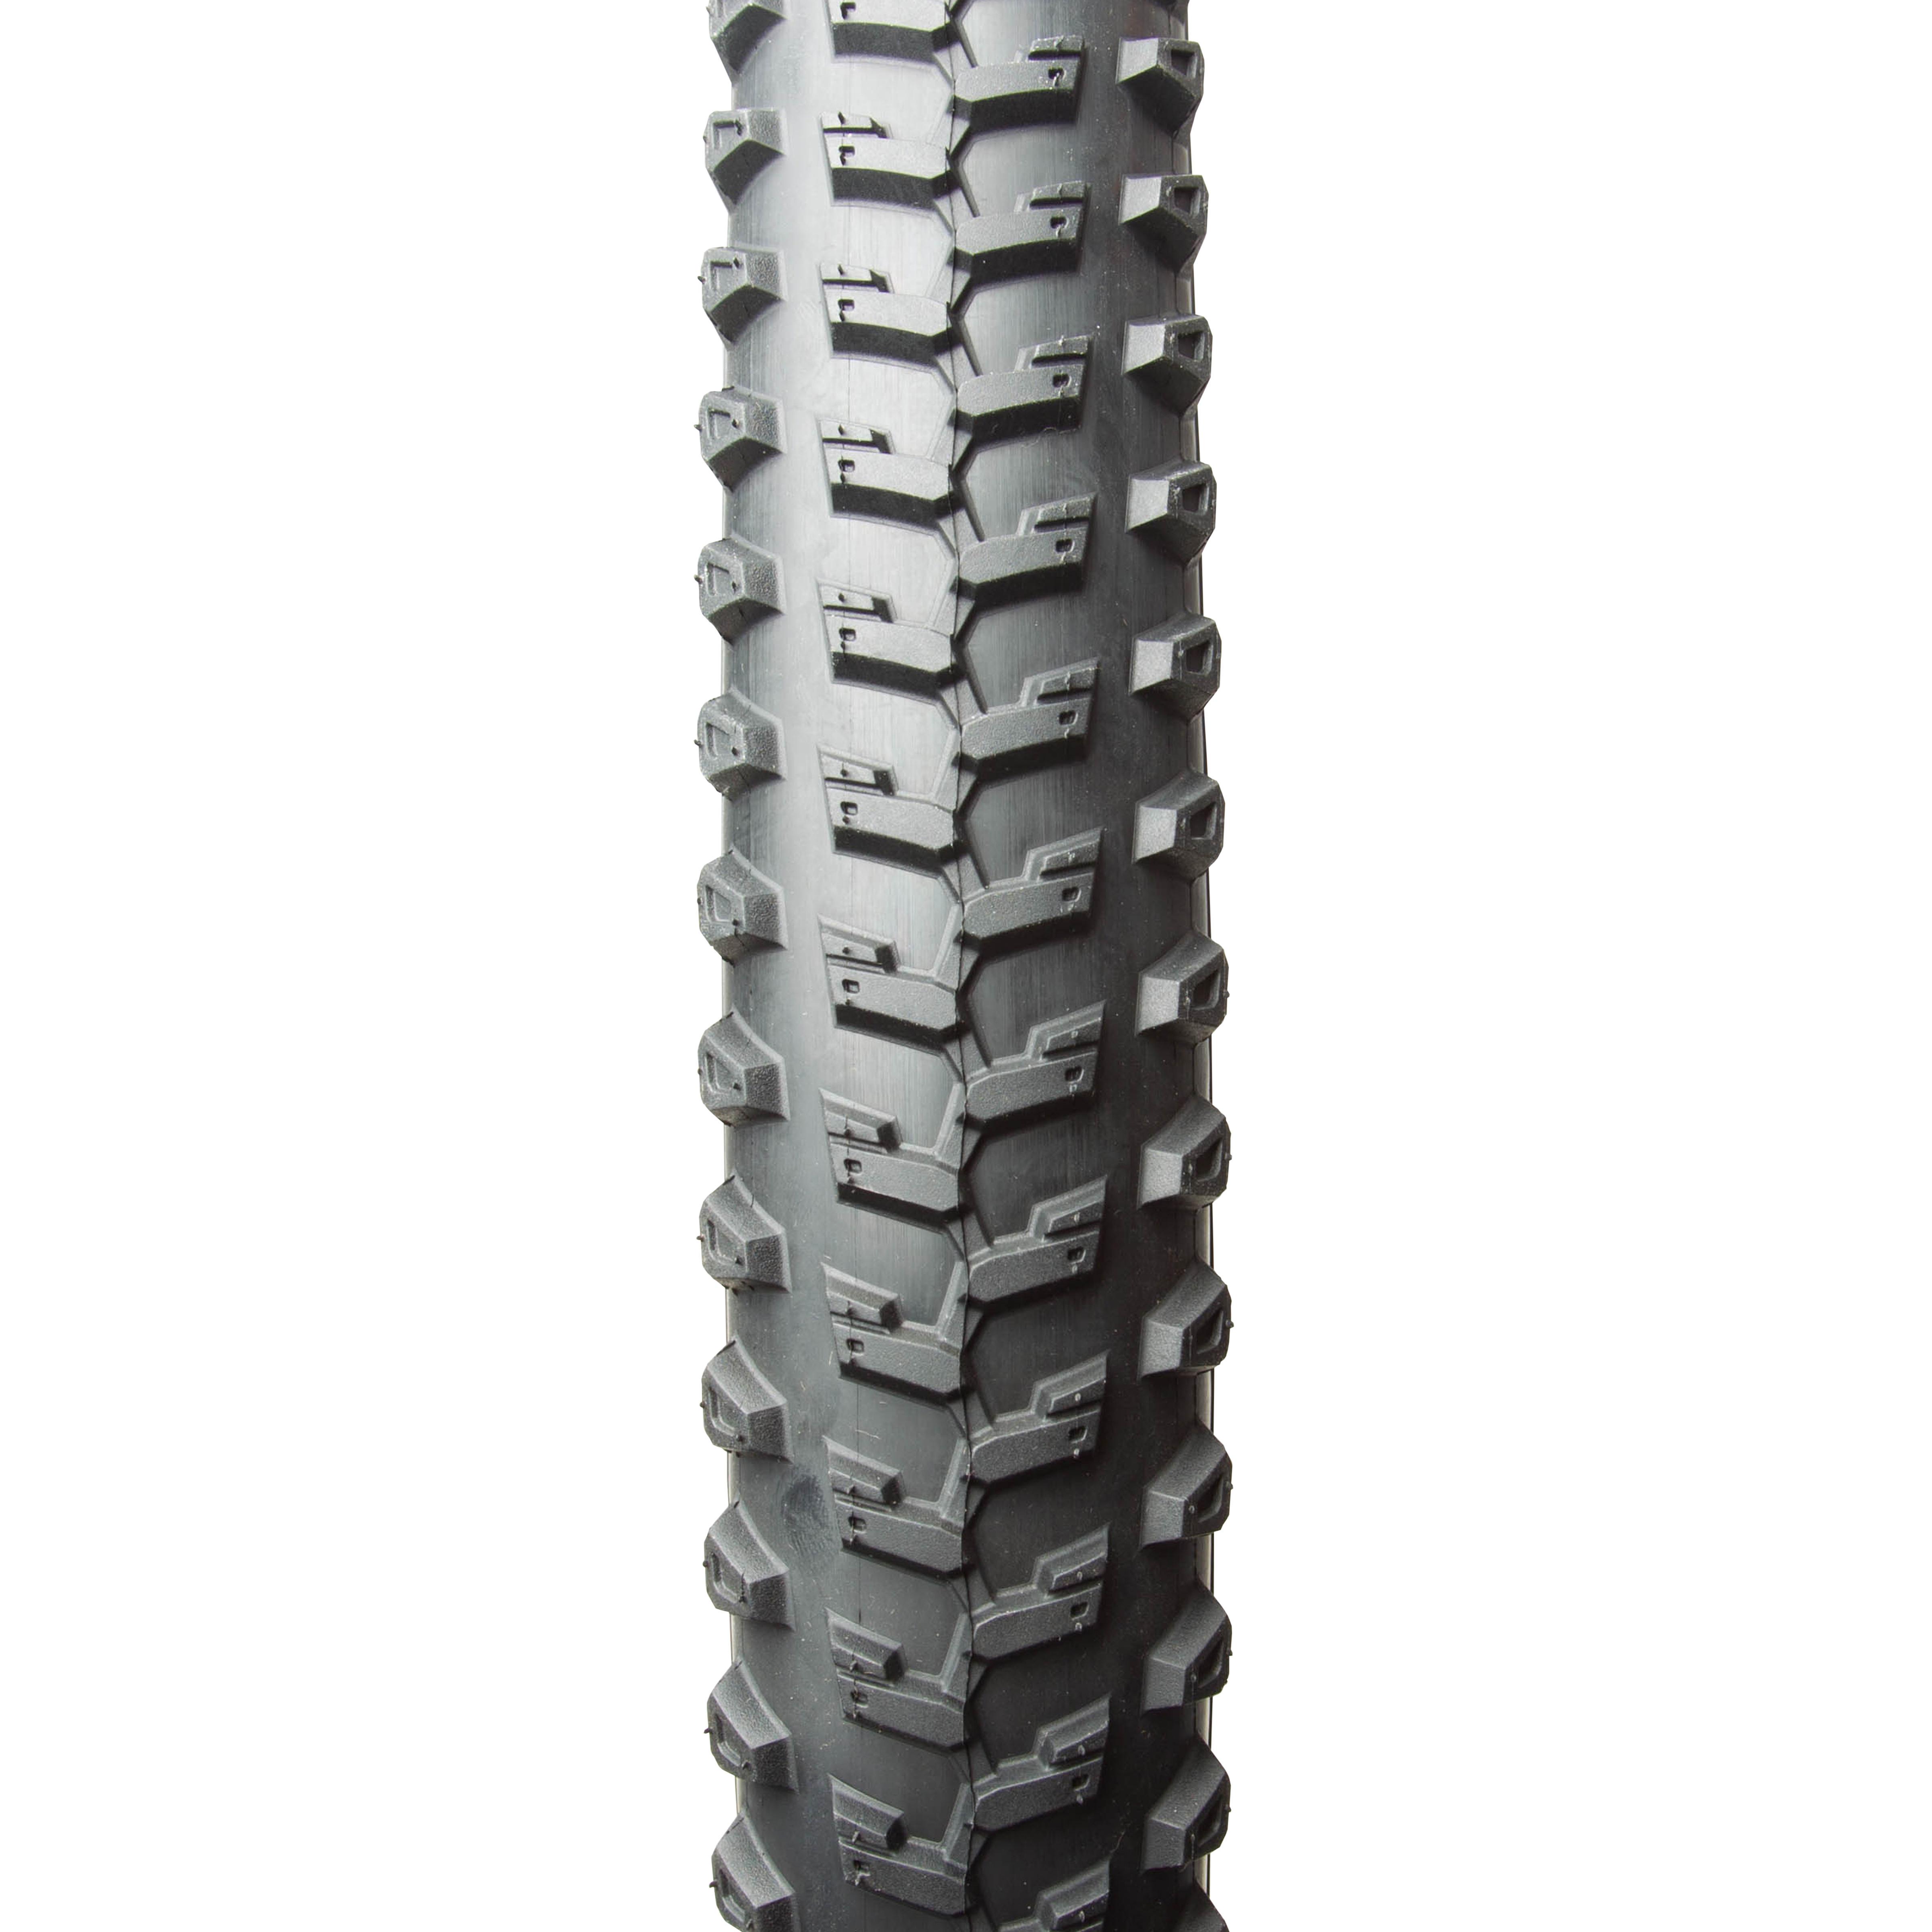 All Terrain 9 Speed 29x2.10 Stiff Bead Mountain Bike Tire / ETRTO 54-622